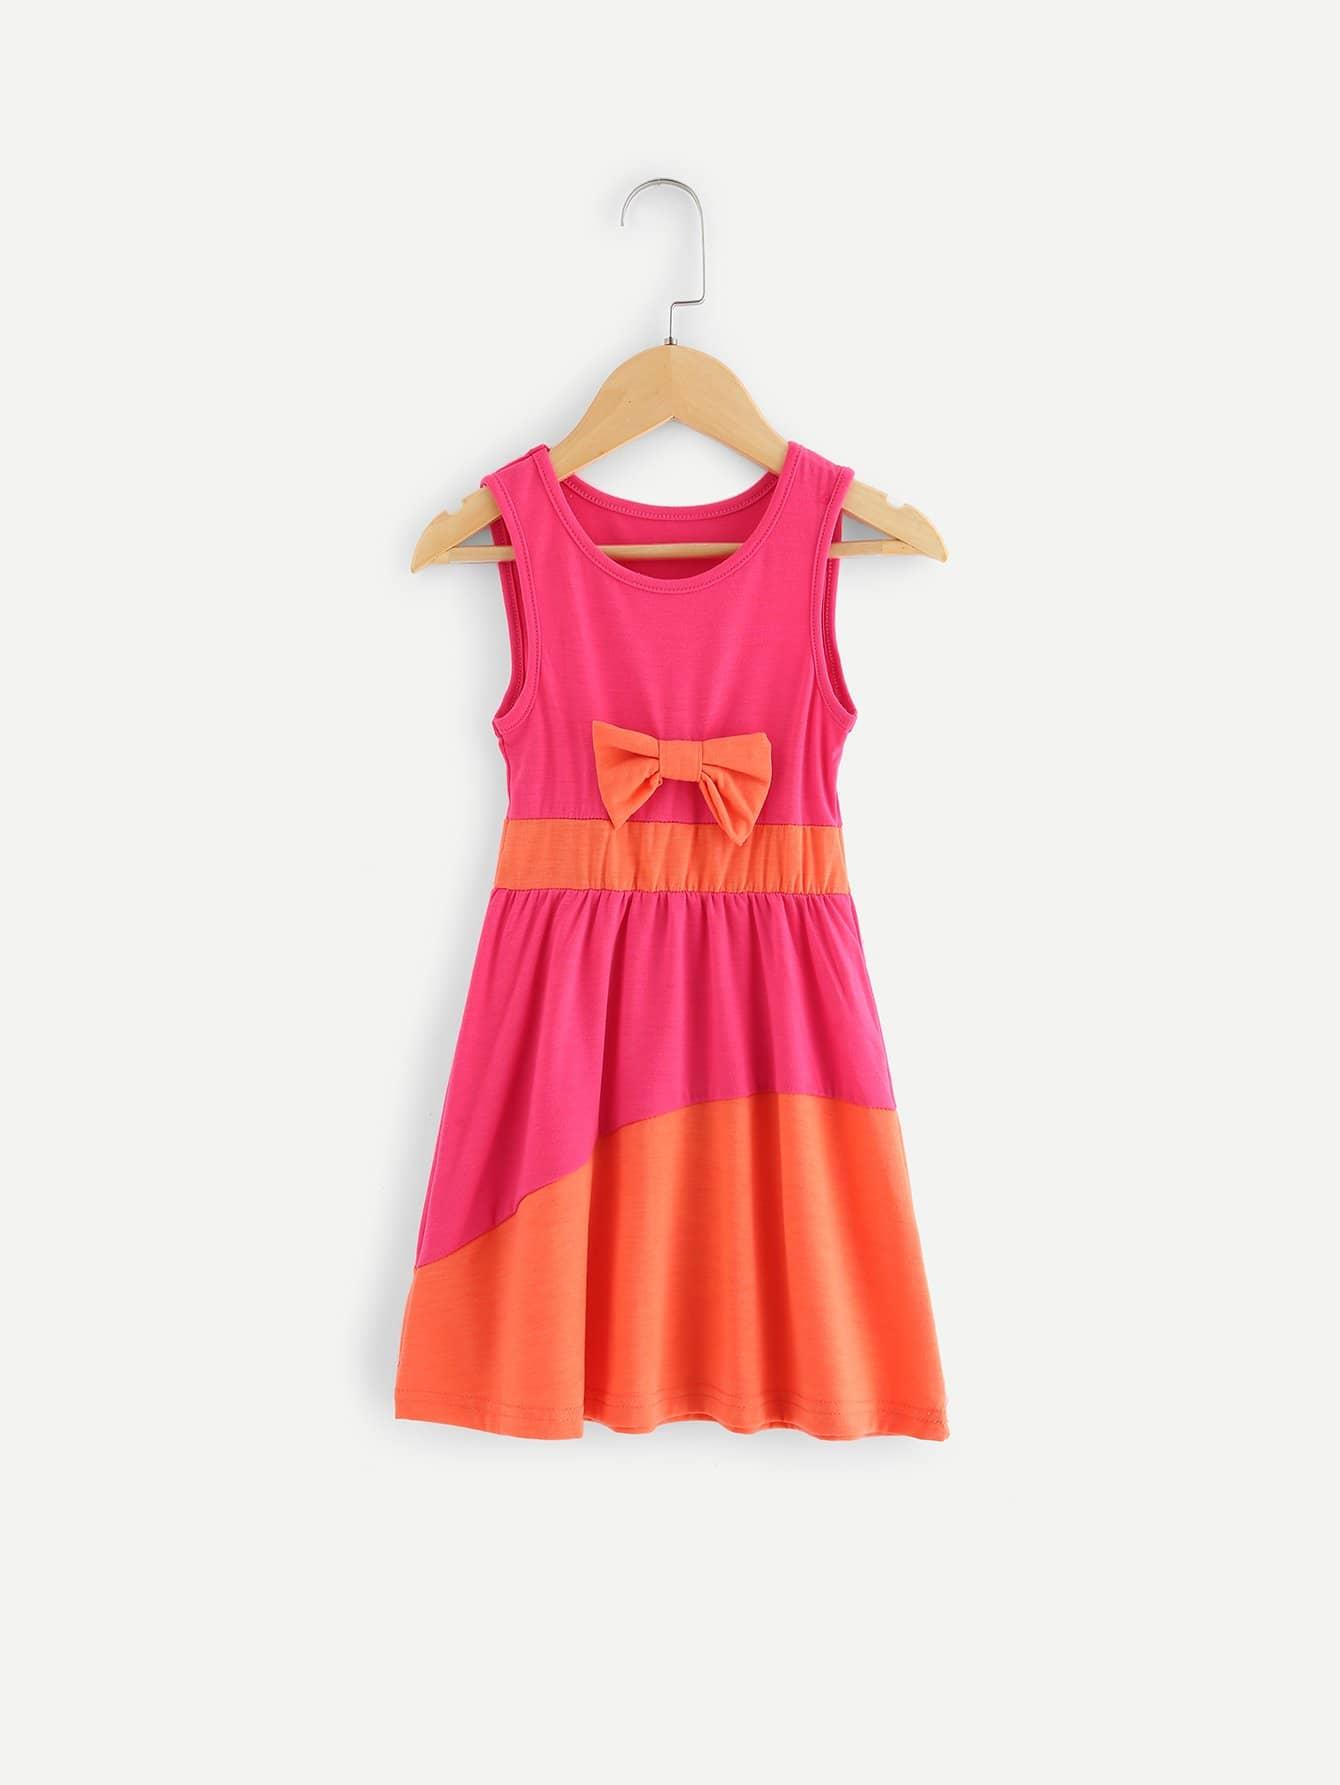 Kids Bow Detail Colorblock Dress kids bow detail 2 in 1 dress